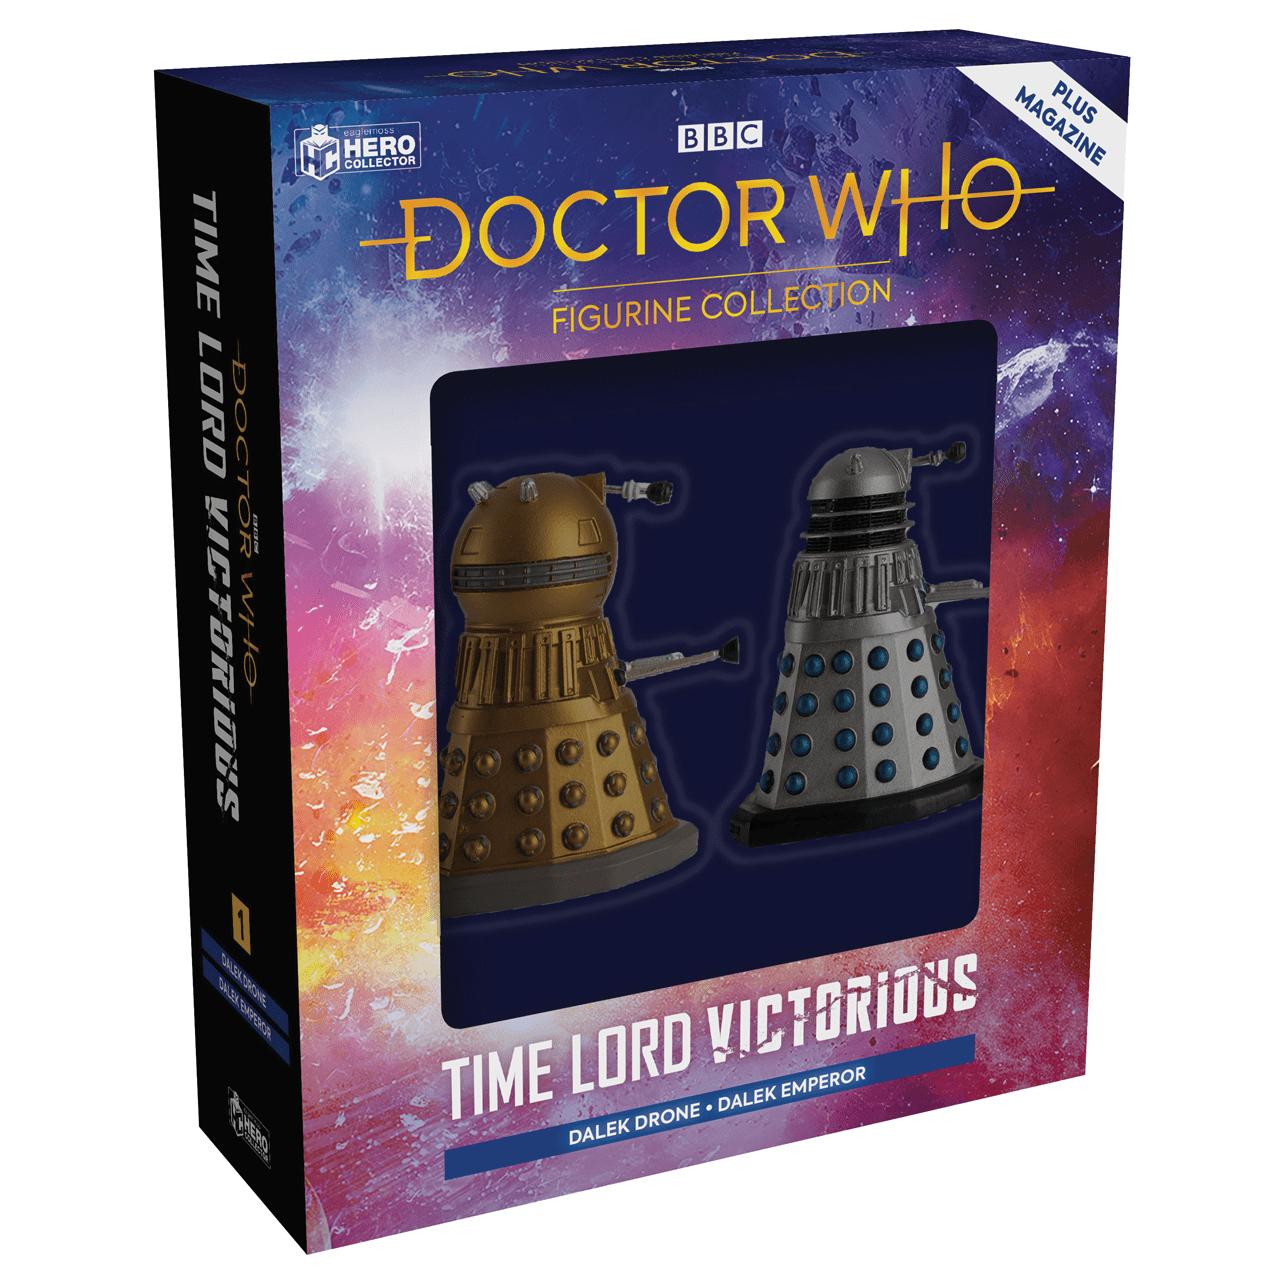 Doctor Who: Dalek Drone and Dalek Emperor Figurine Set: Hero Collector - 1